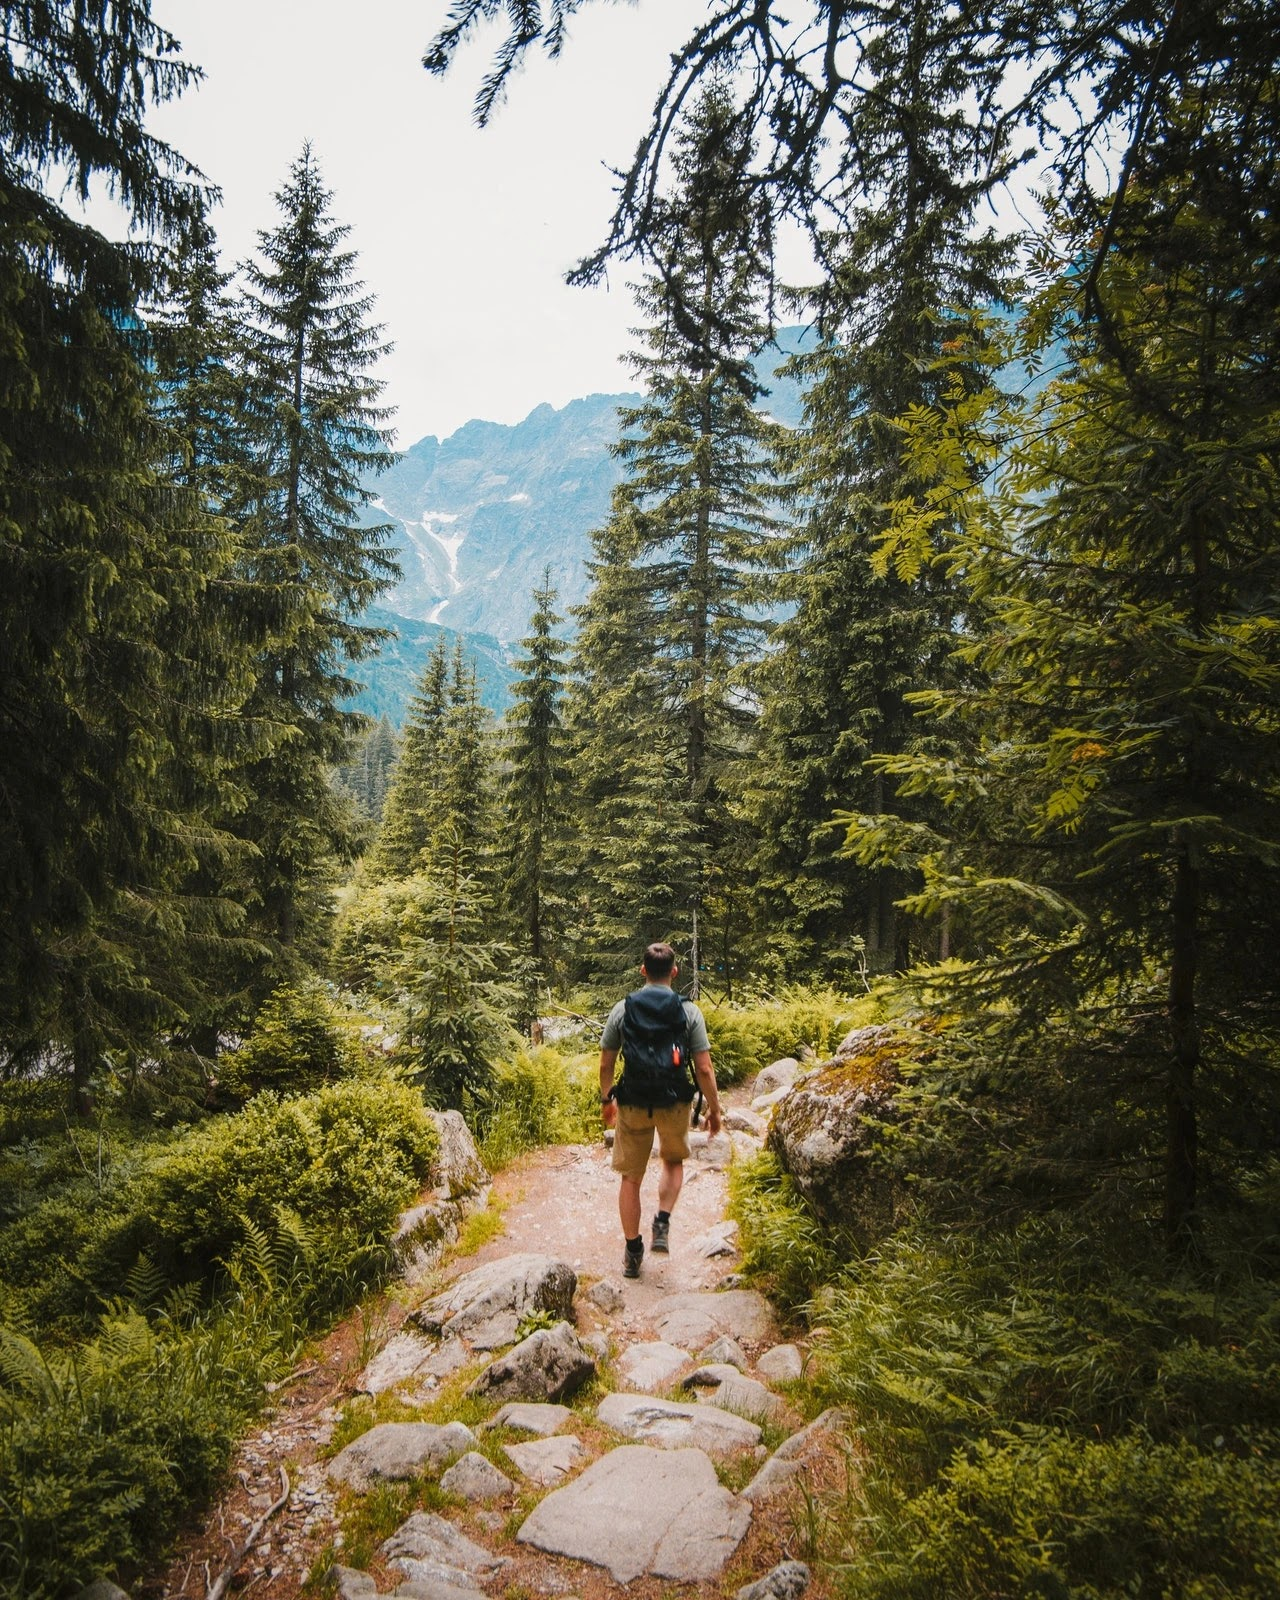 jalur pendakian gunung foto josh hild